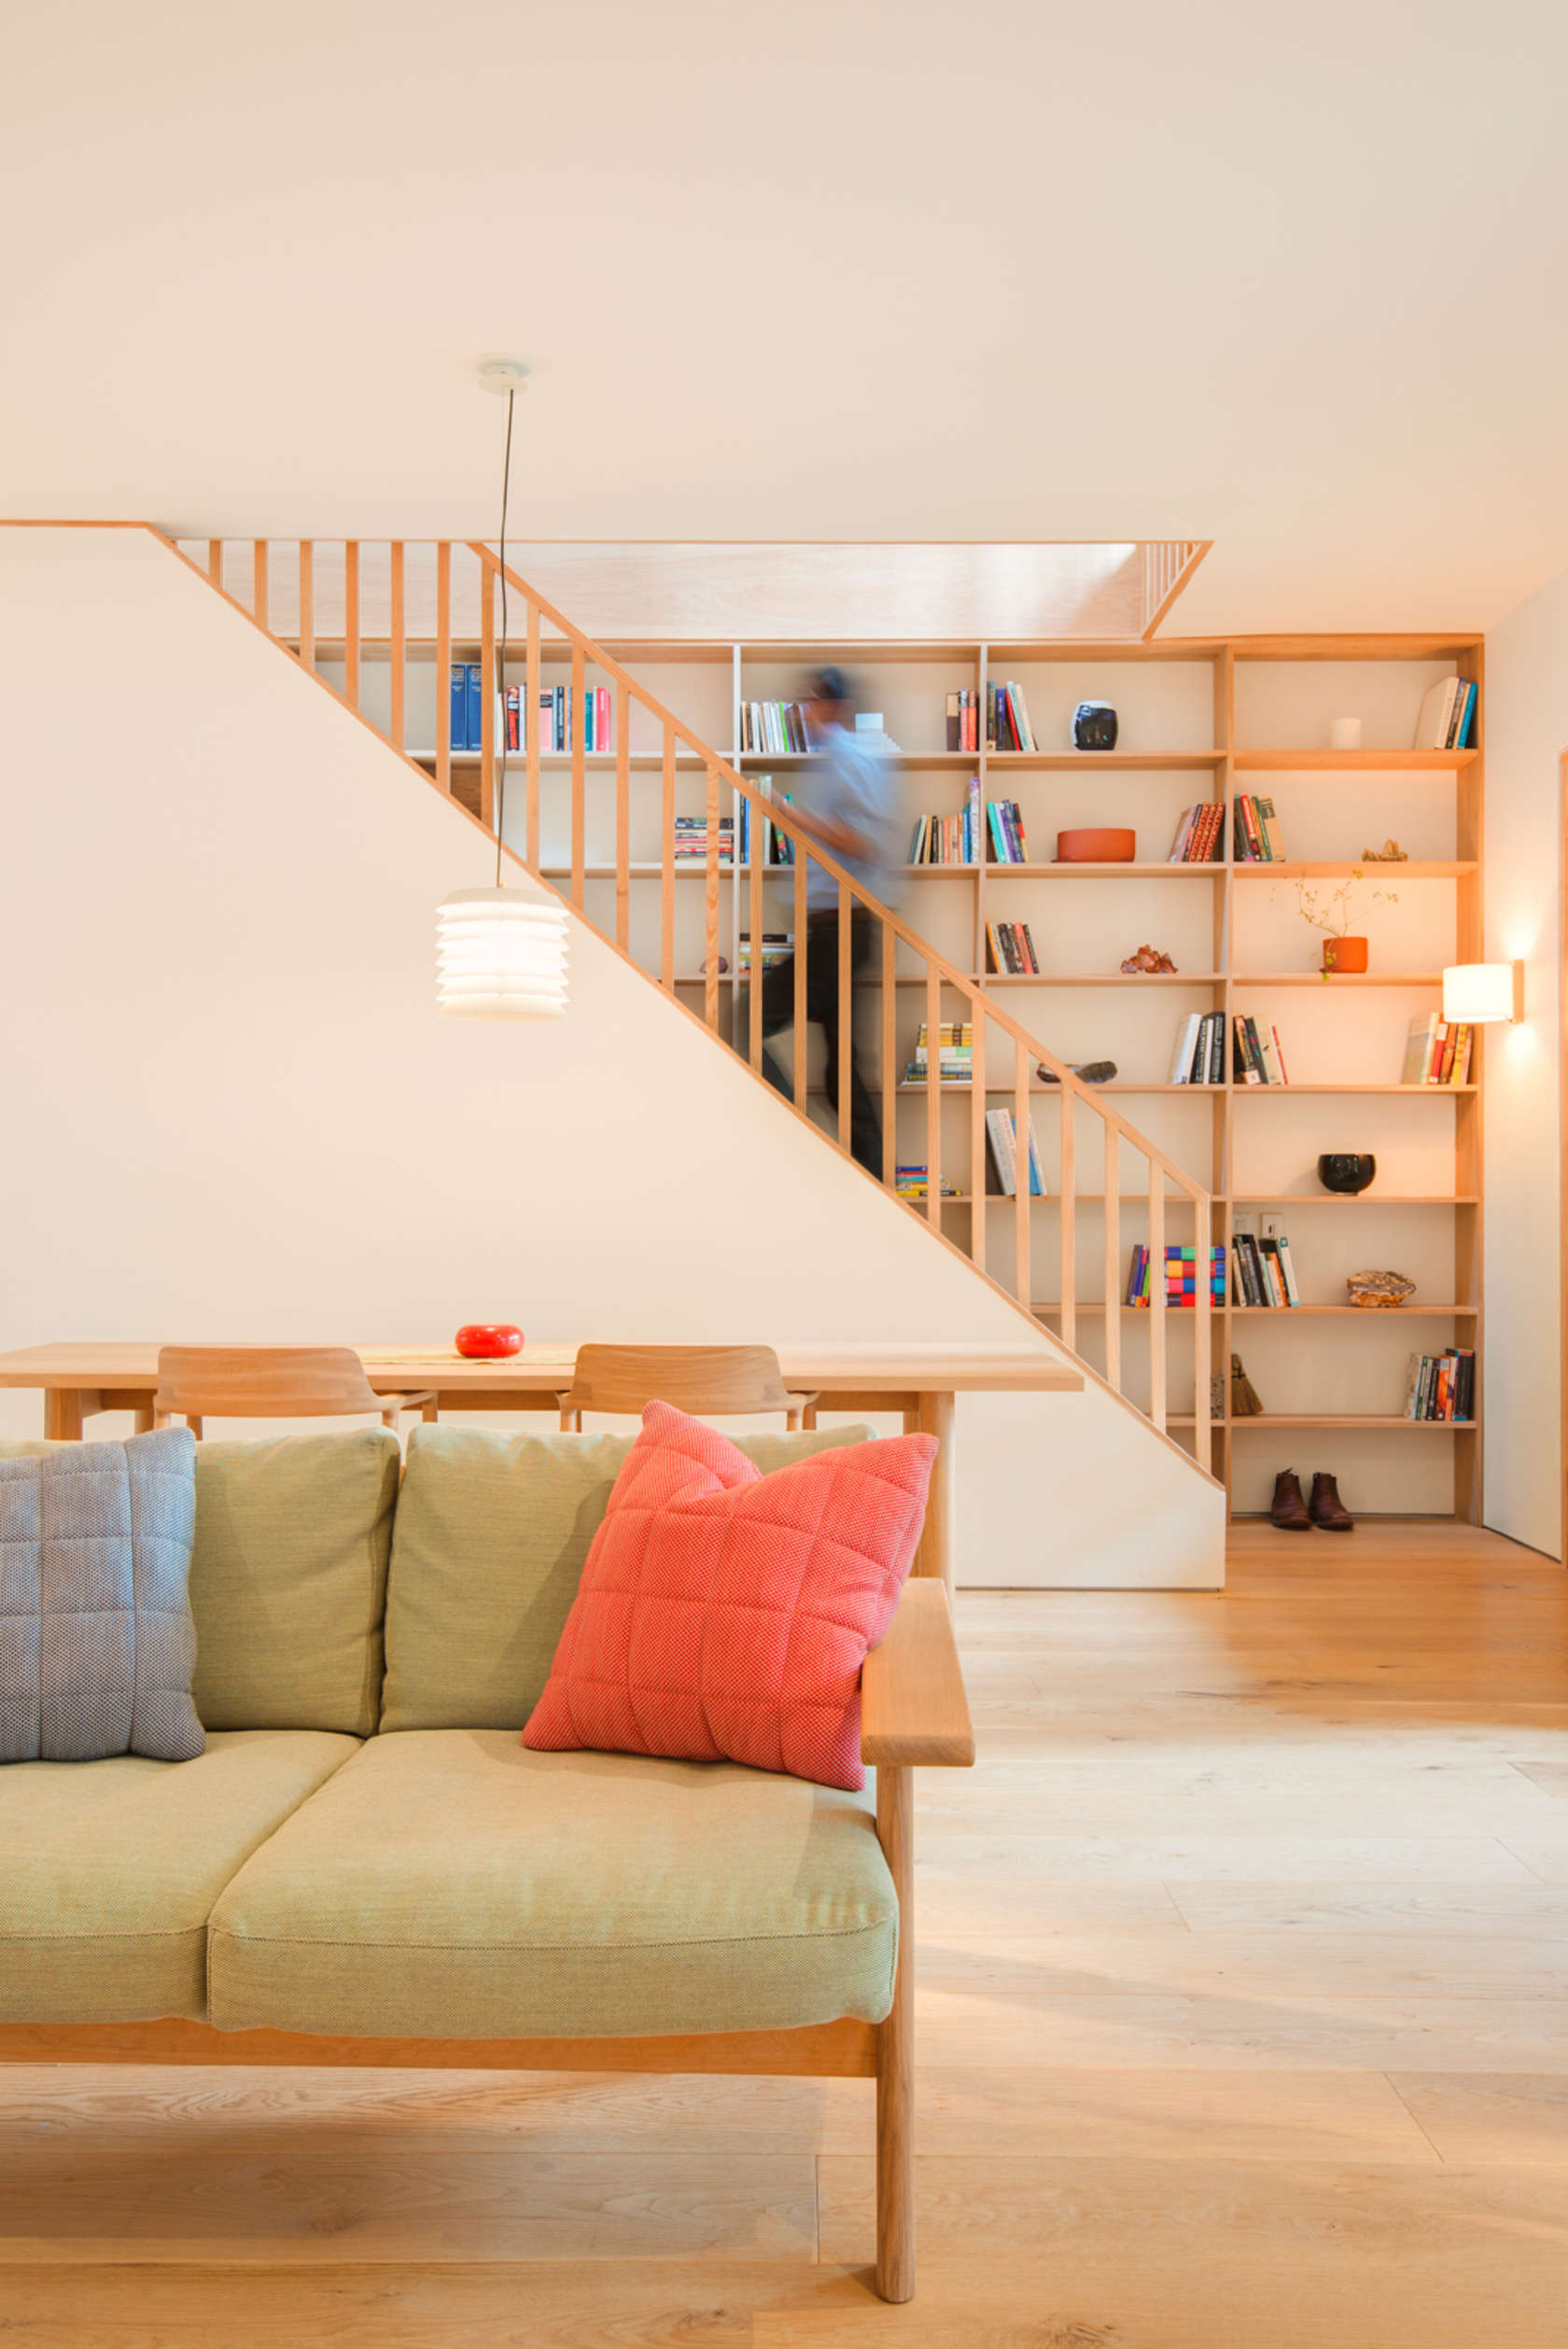 5-casa-no-canada-recebe-reforma-para-integrar-as-areas-comuns